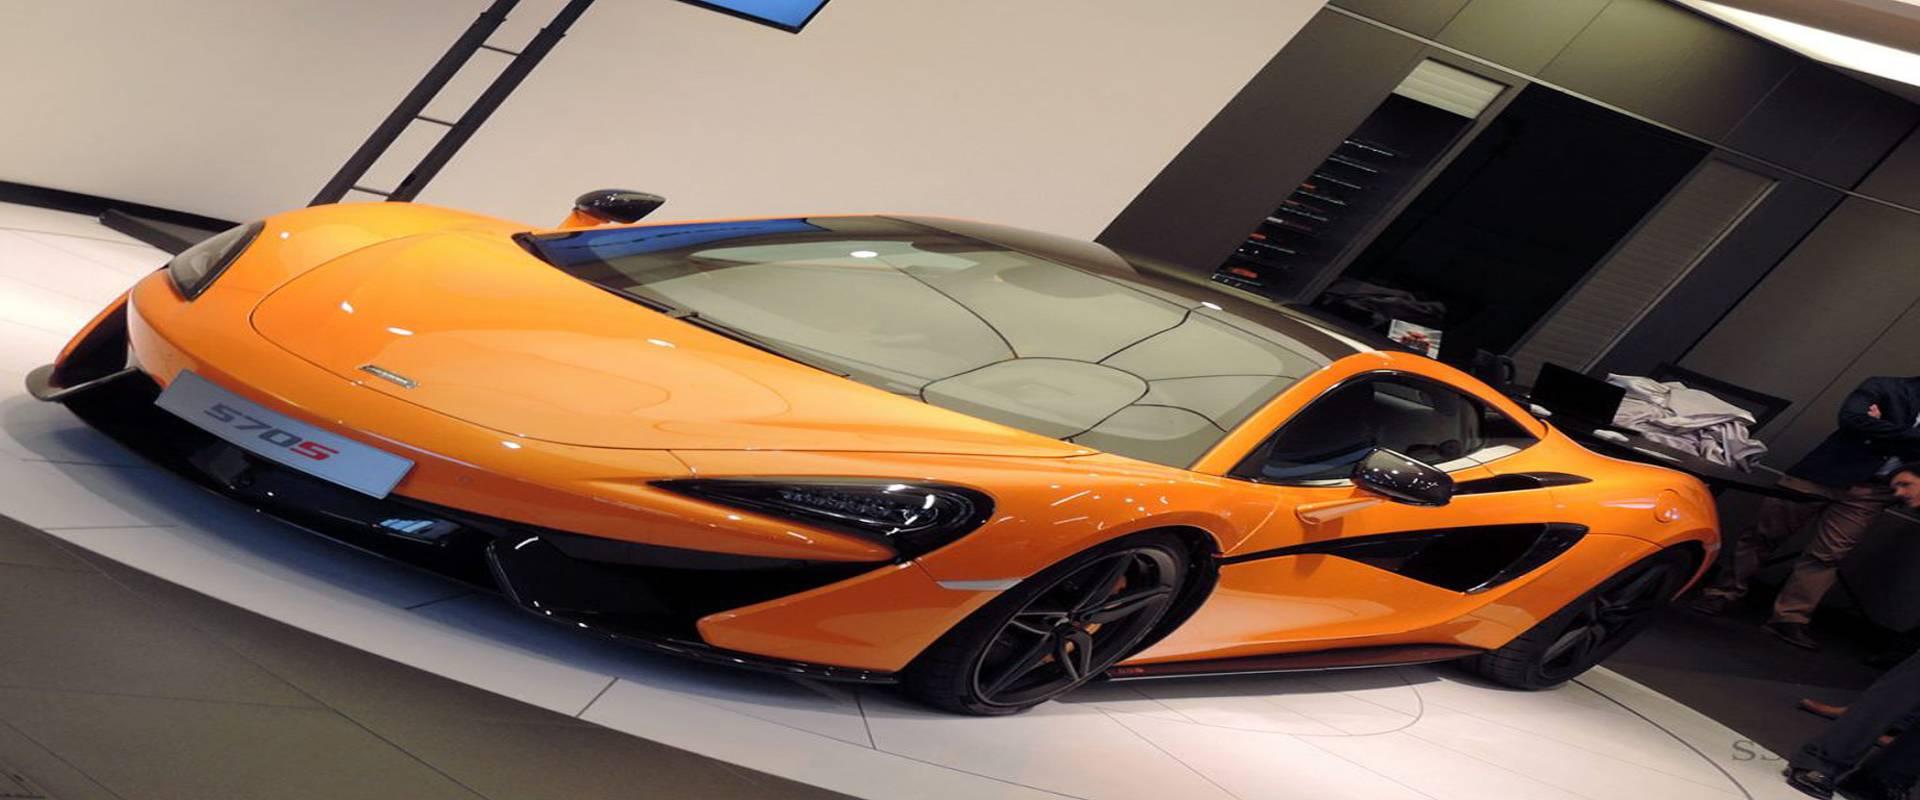 Weekend with a McLaren 570S